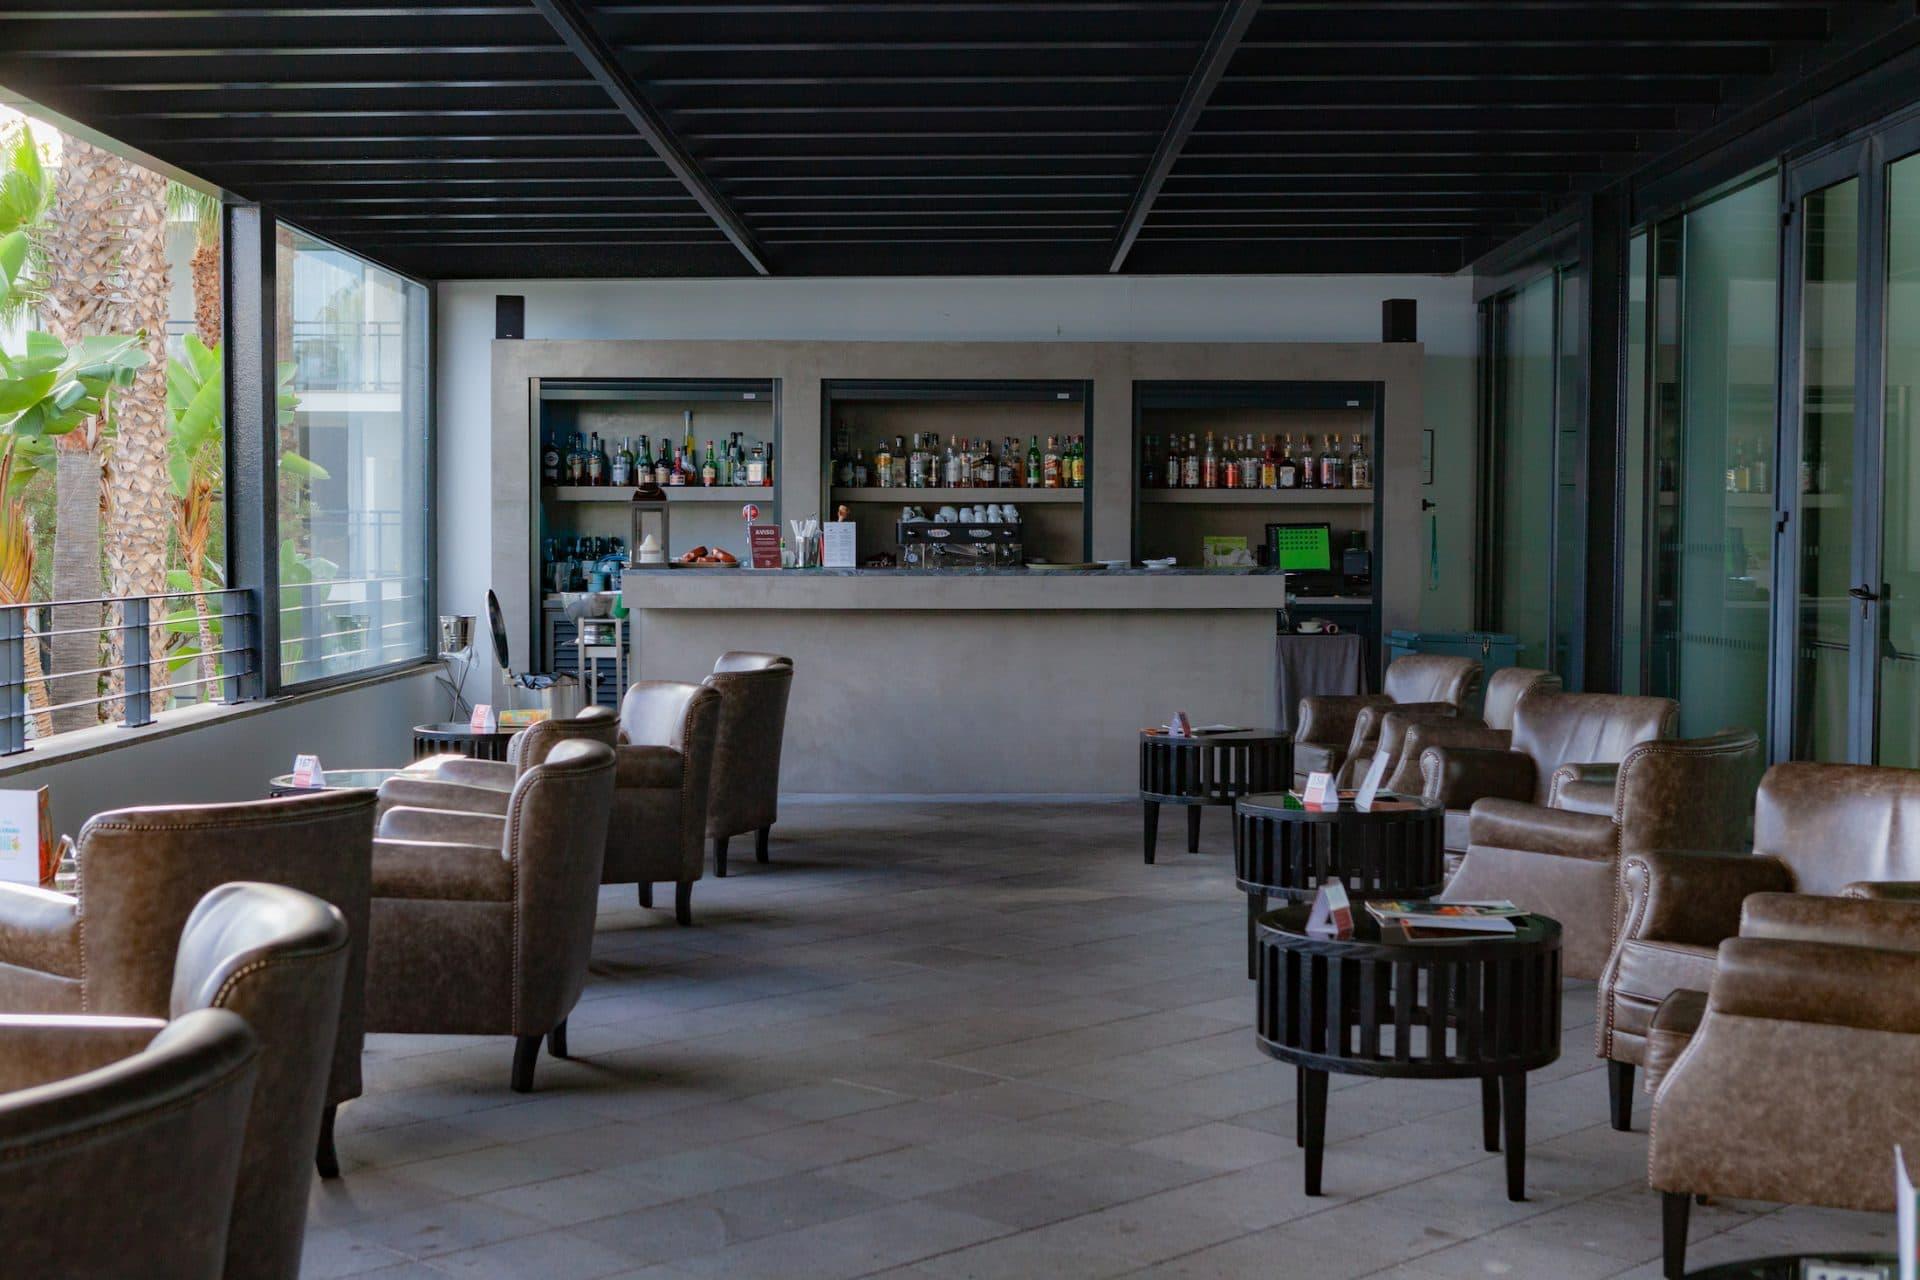 ocean-lounge-bar-space-VidaMar-Hotels-Resorts-Madeira